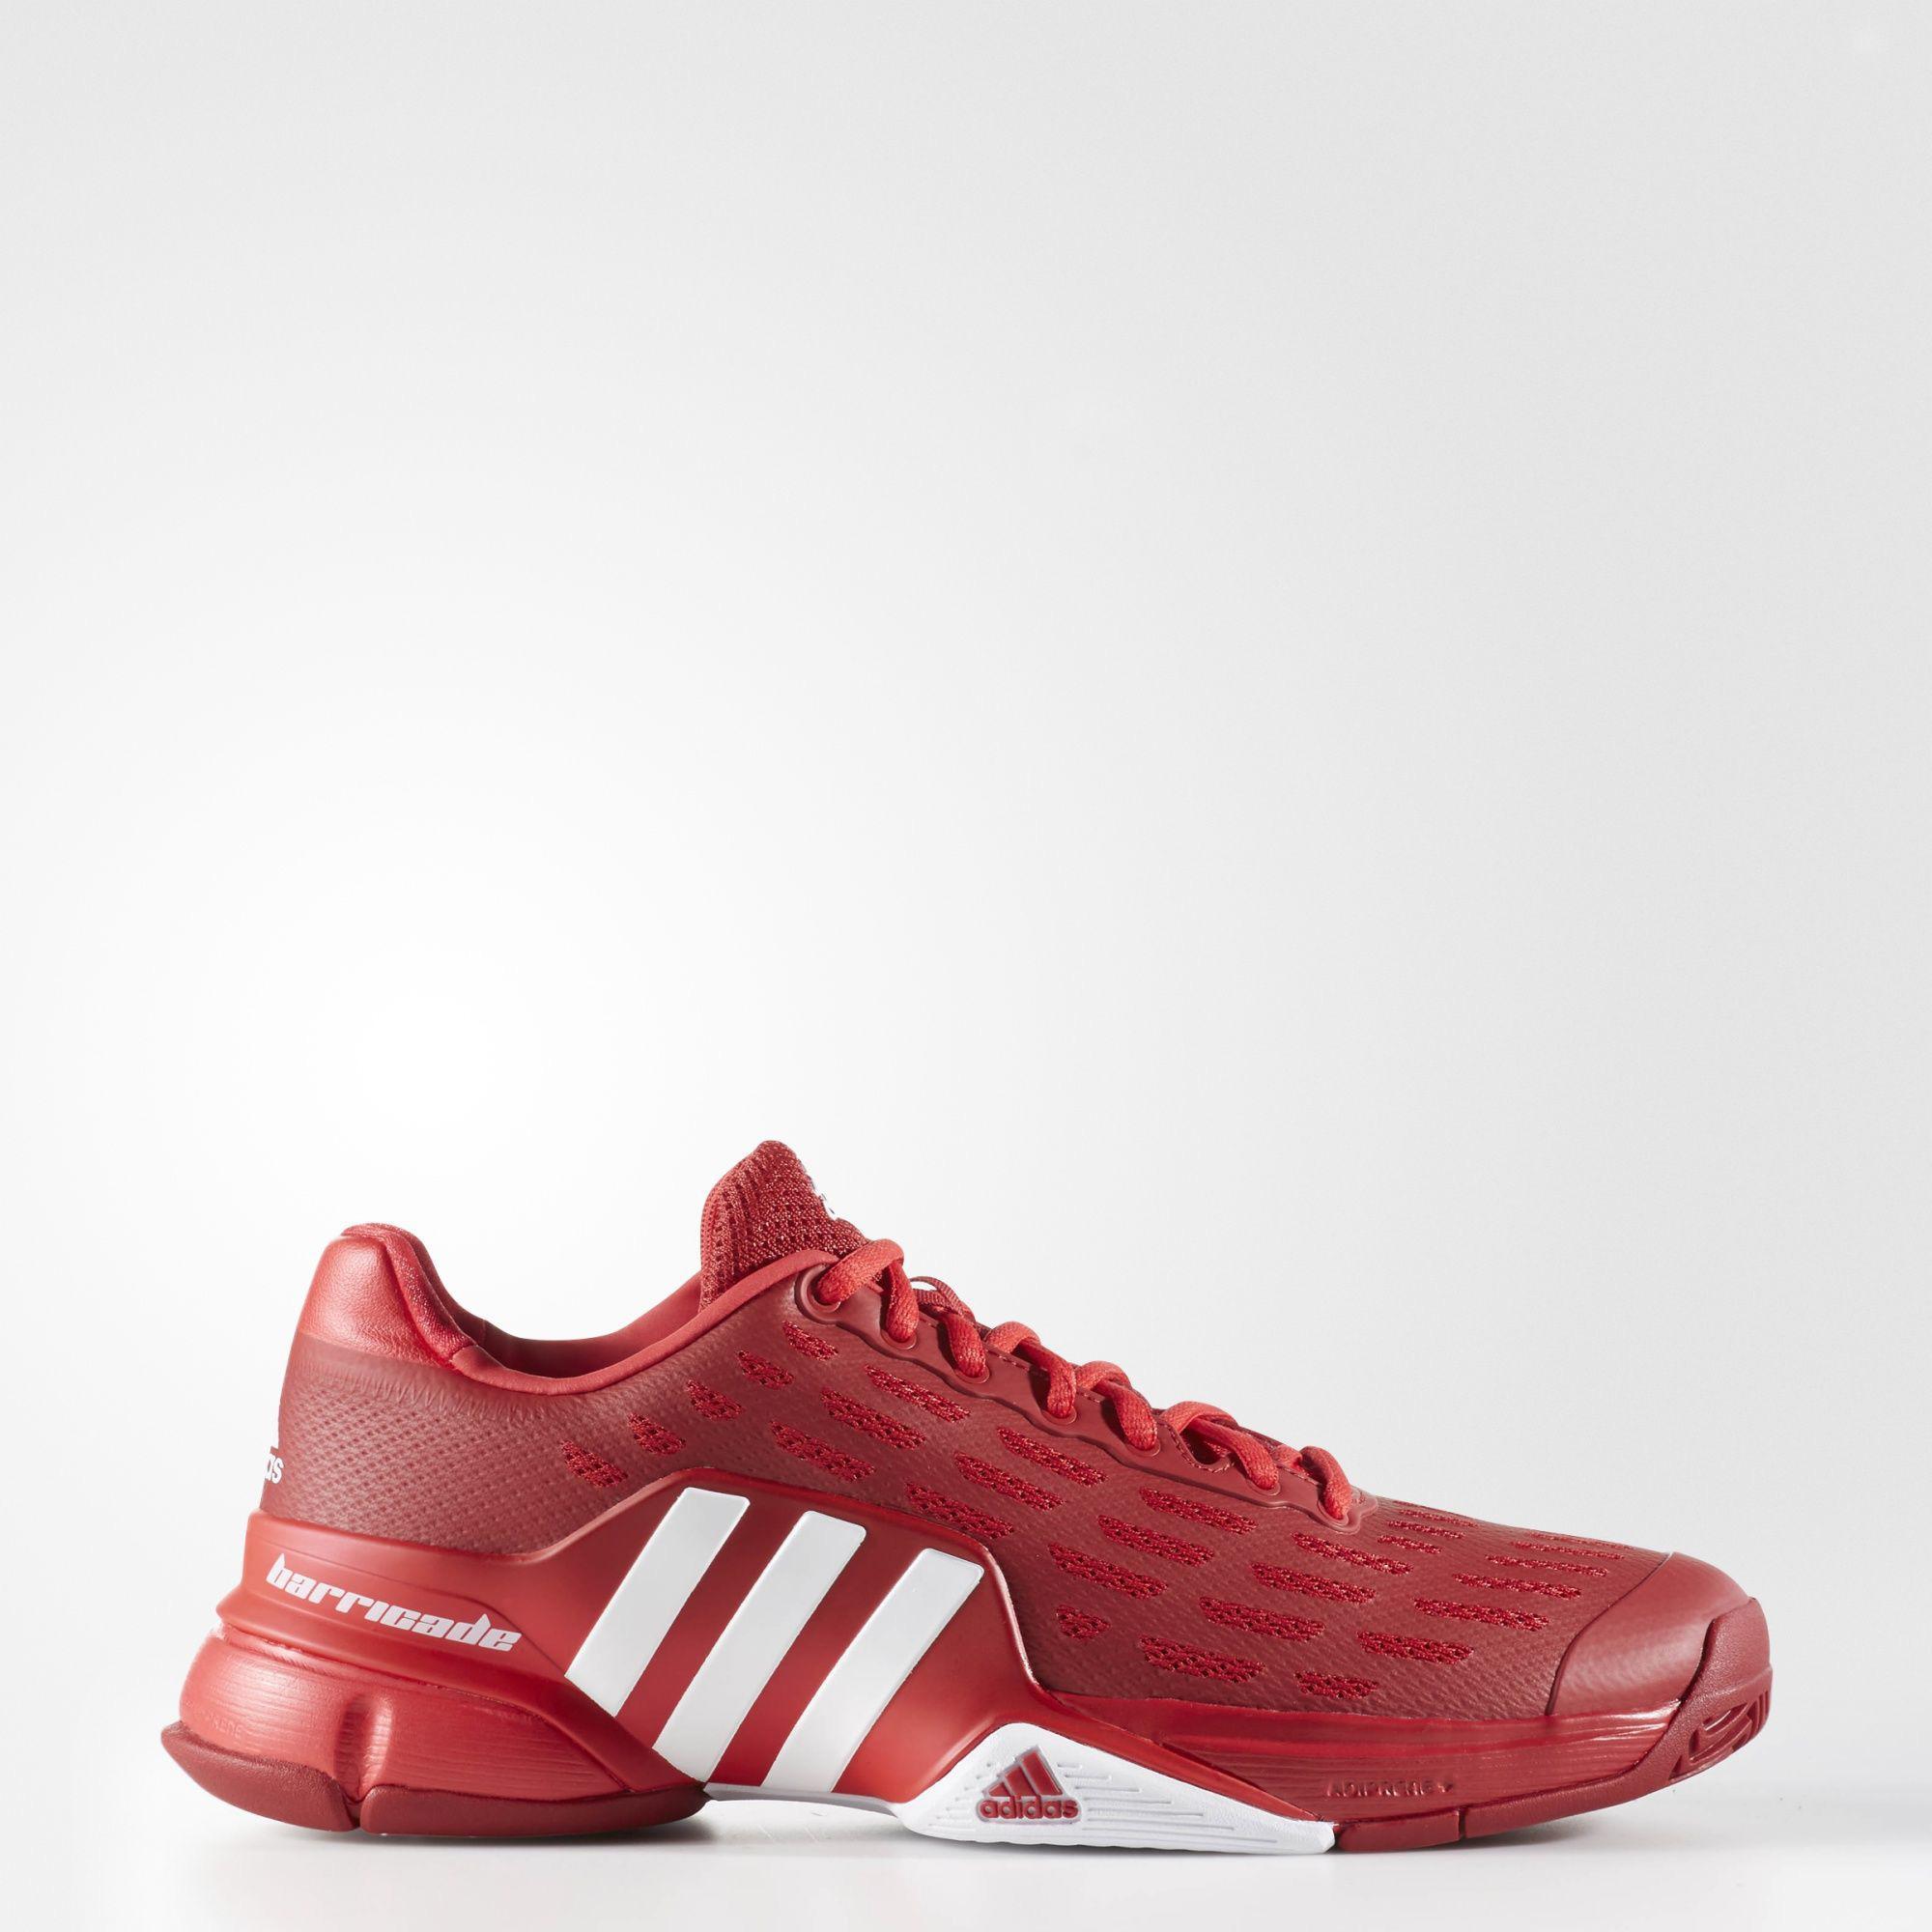 Adidas Mens Barricade 2016 Tennis Shoes - Red